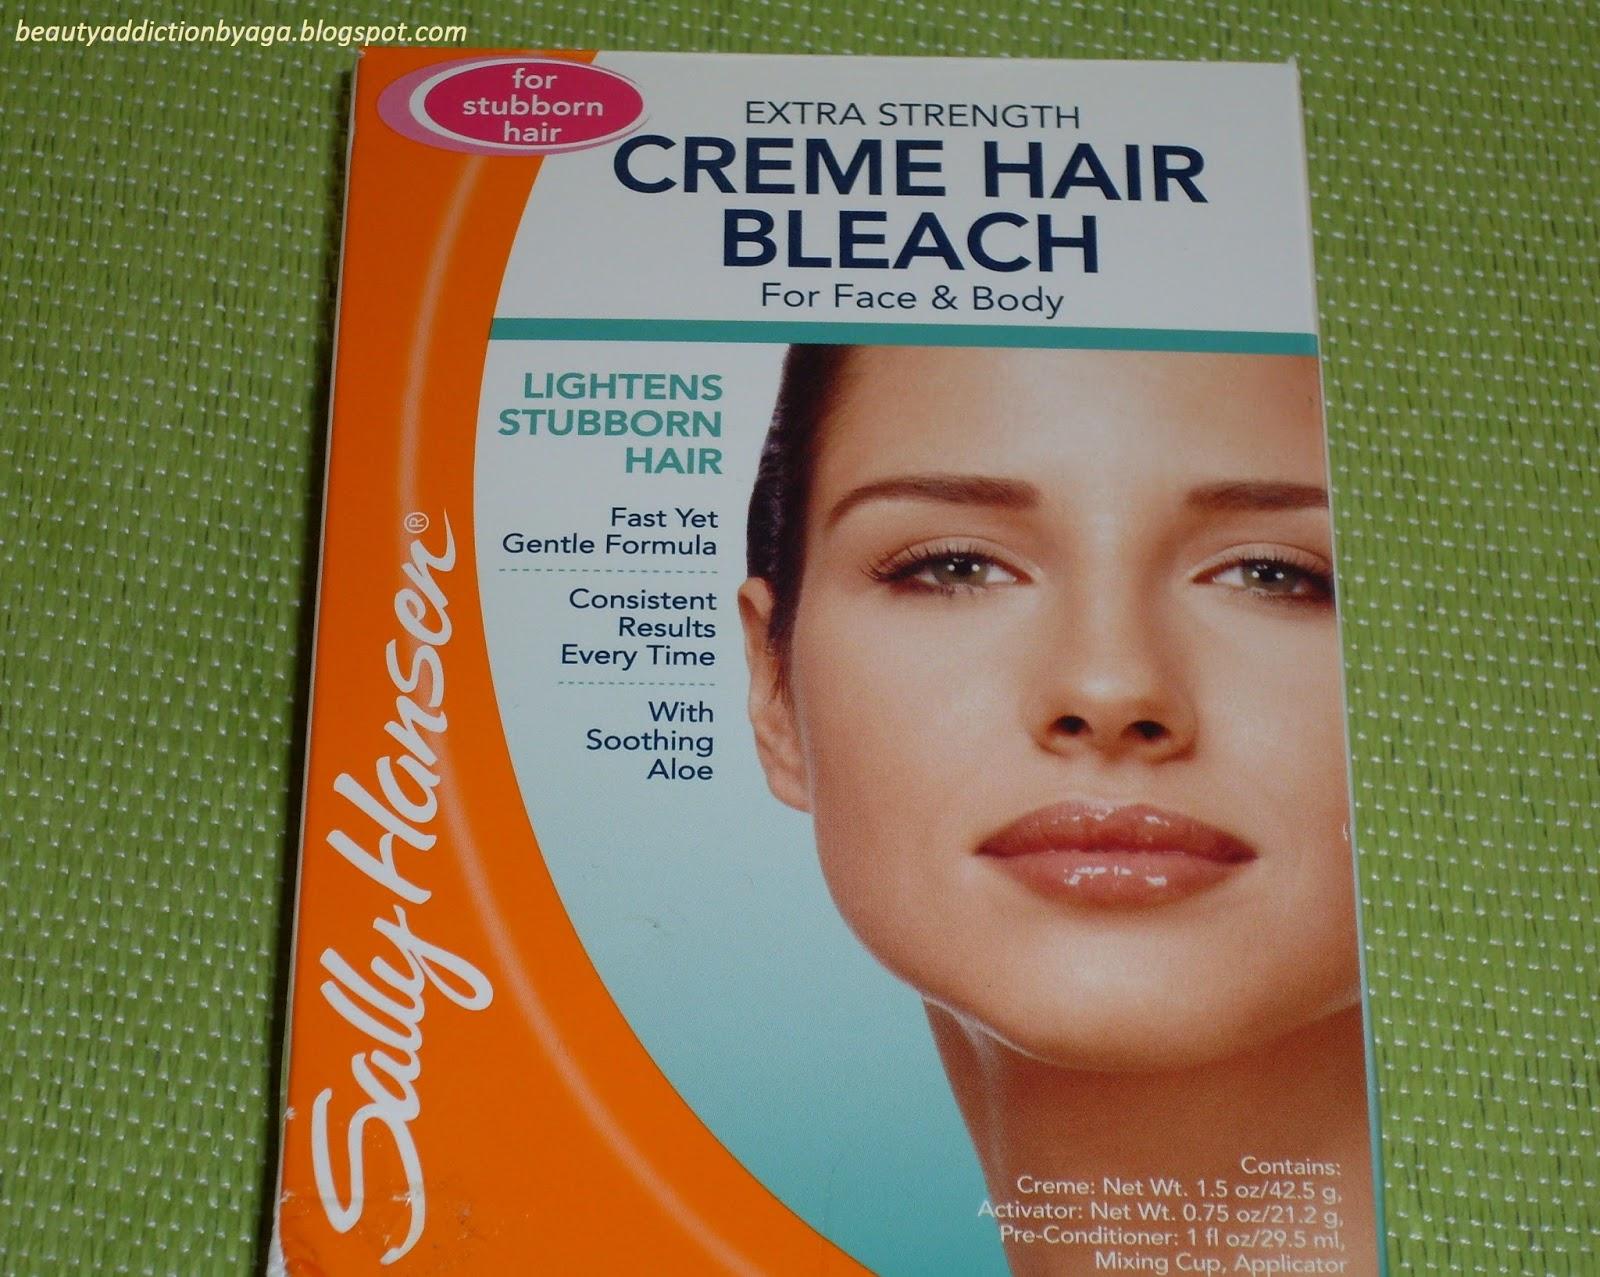 sally hansen creme hair bleach for face instructions